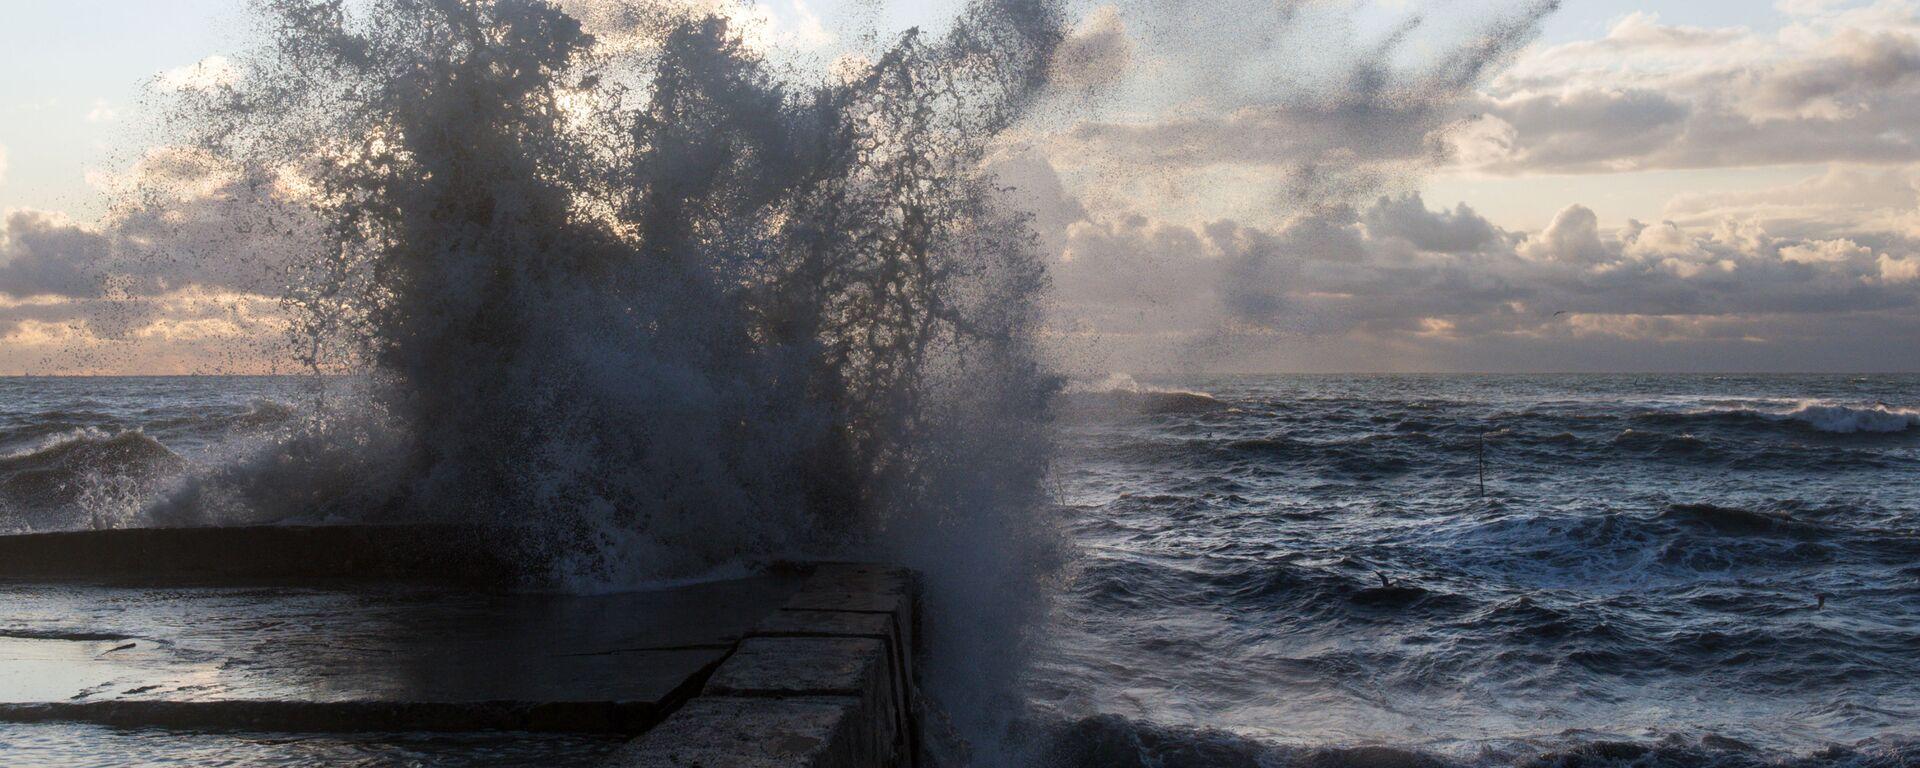 Morze Czarne. - Sputnik Polska, 1920, 24.06.2021